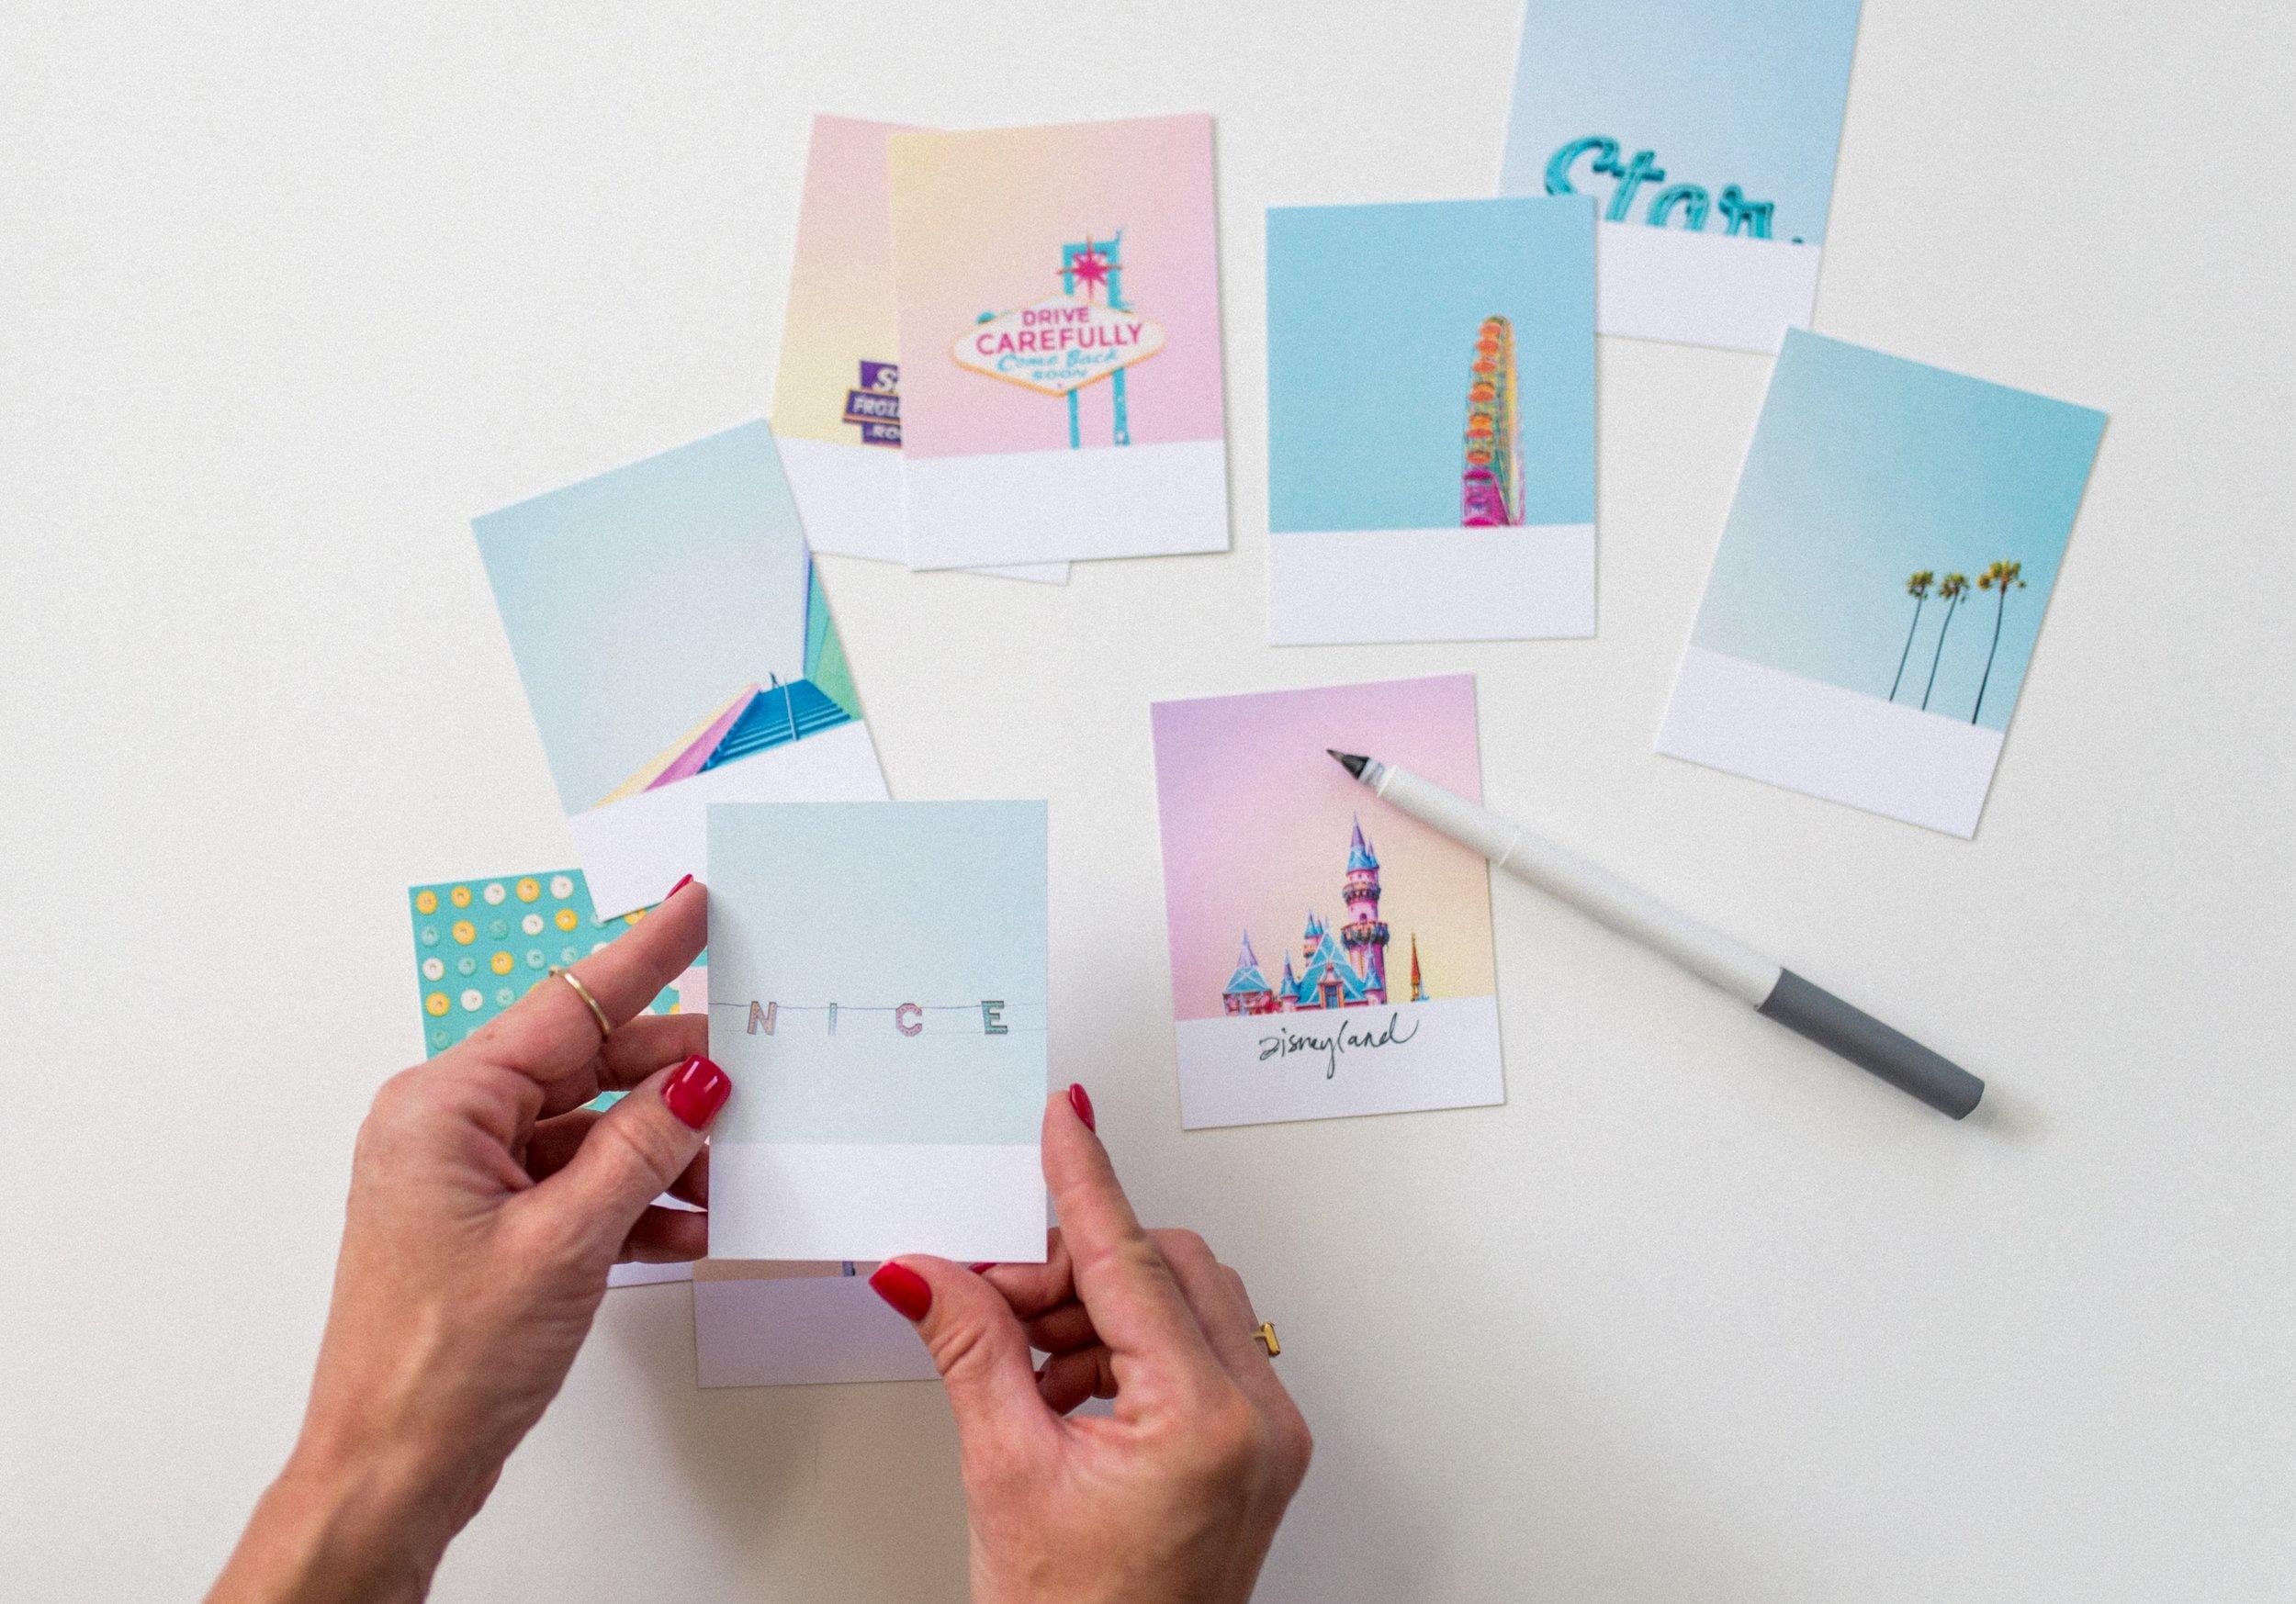 persnickety-prints-1054086-unsplash.jpg